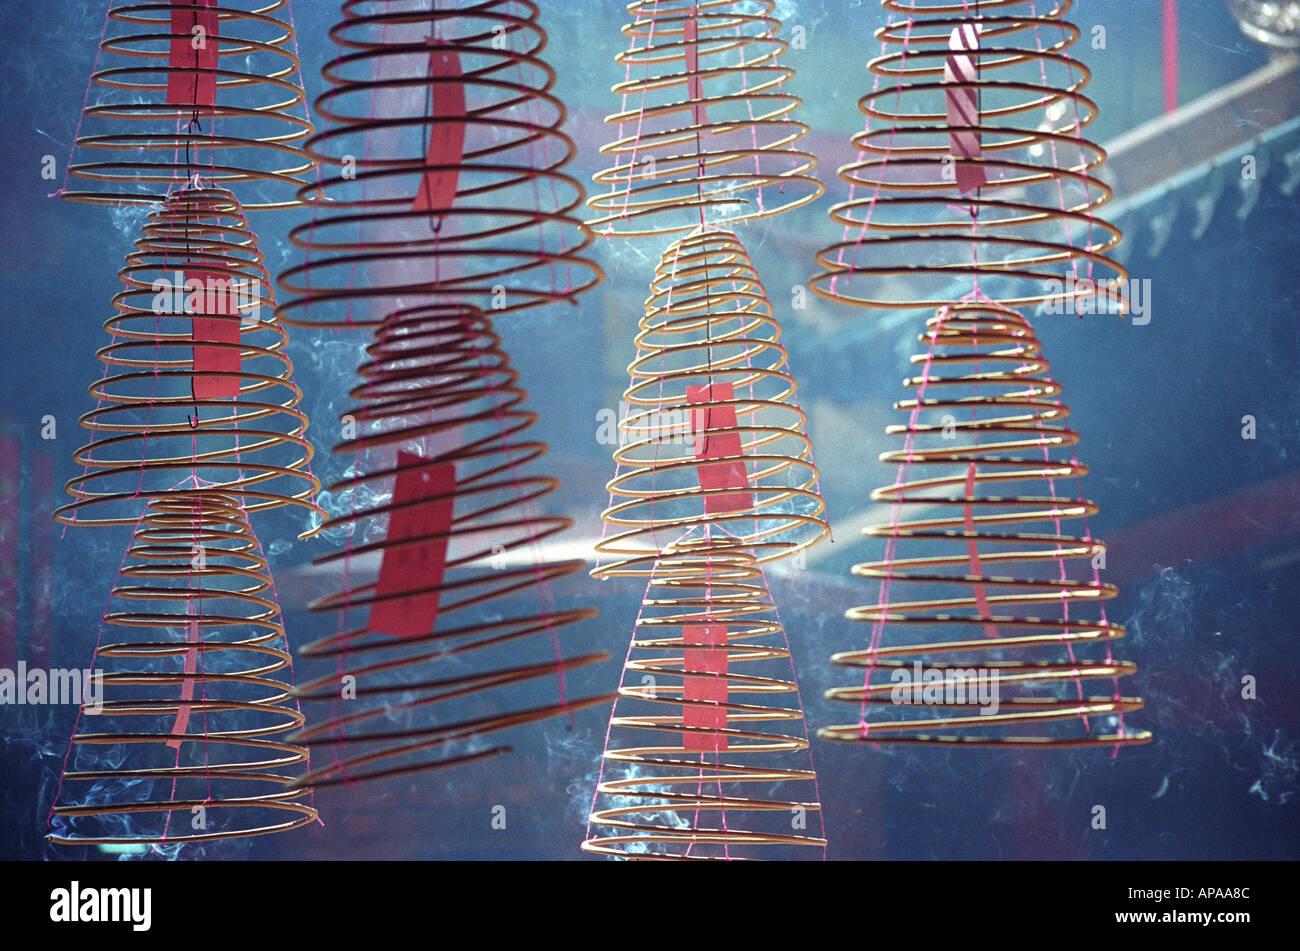 Bobines d'encens dans un temple chinois, Kuala Lumpur (Malaisie) Photo Stock